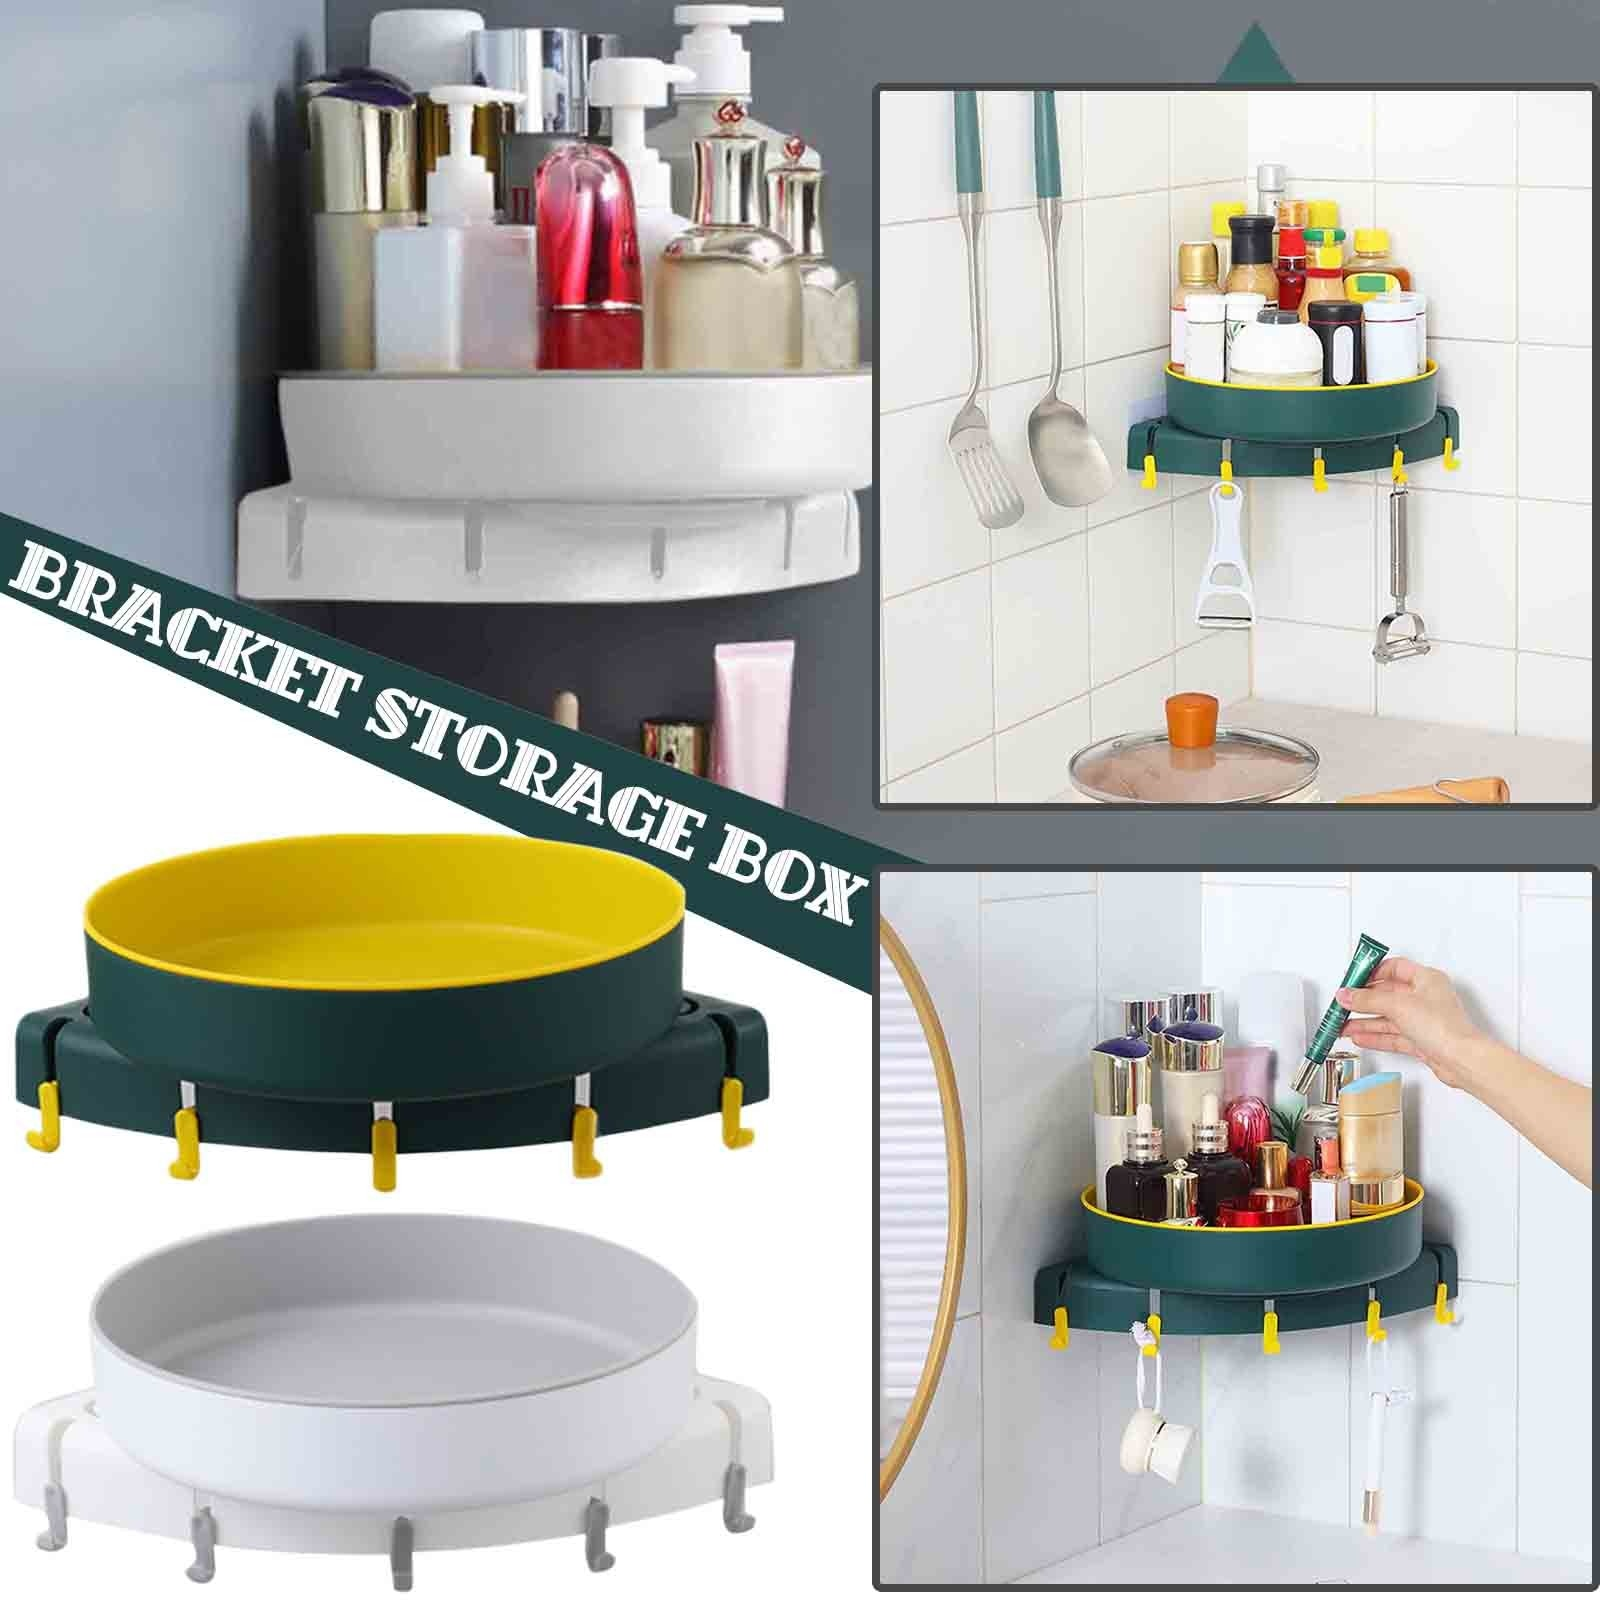 Mount free Rotatable Bathroom Organizing Rack